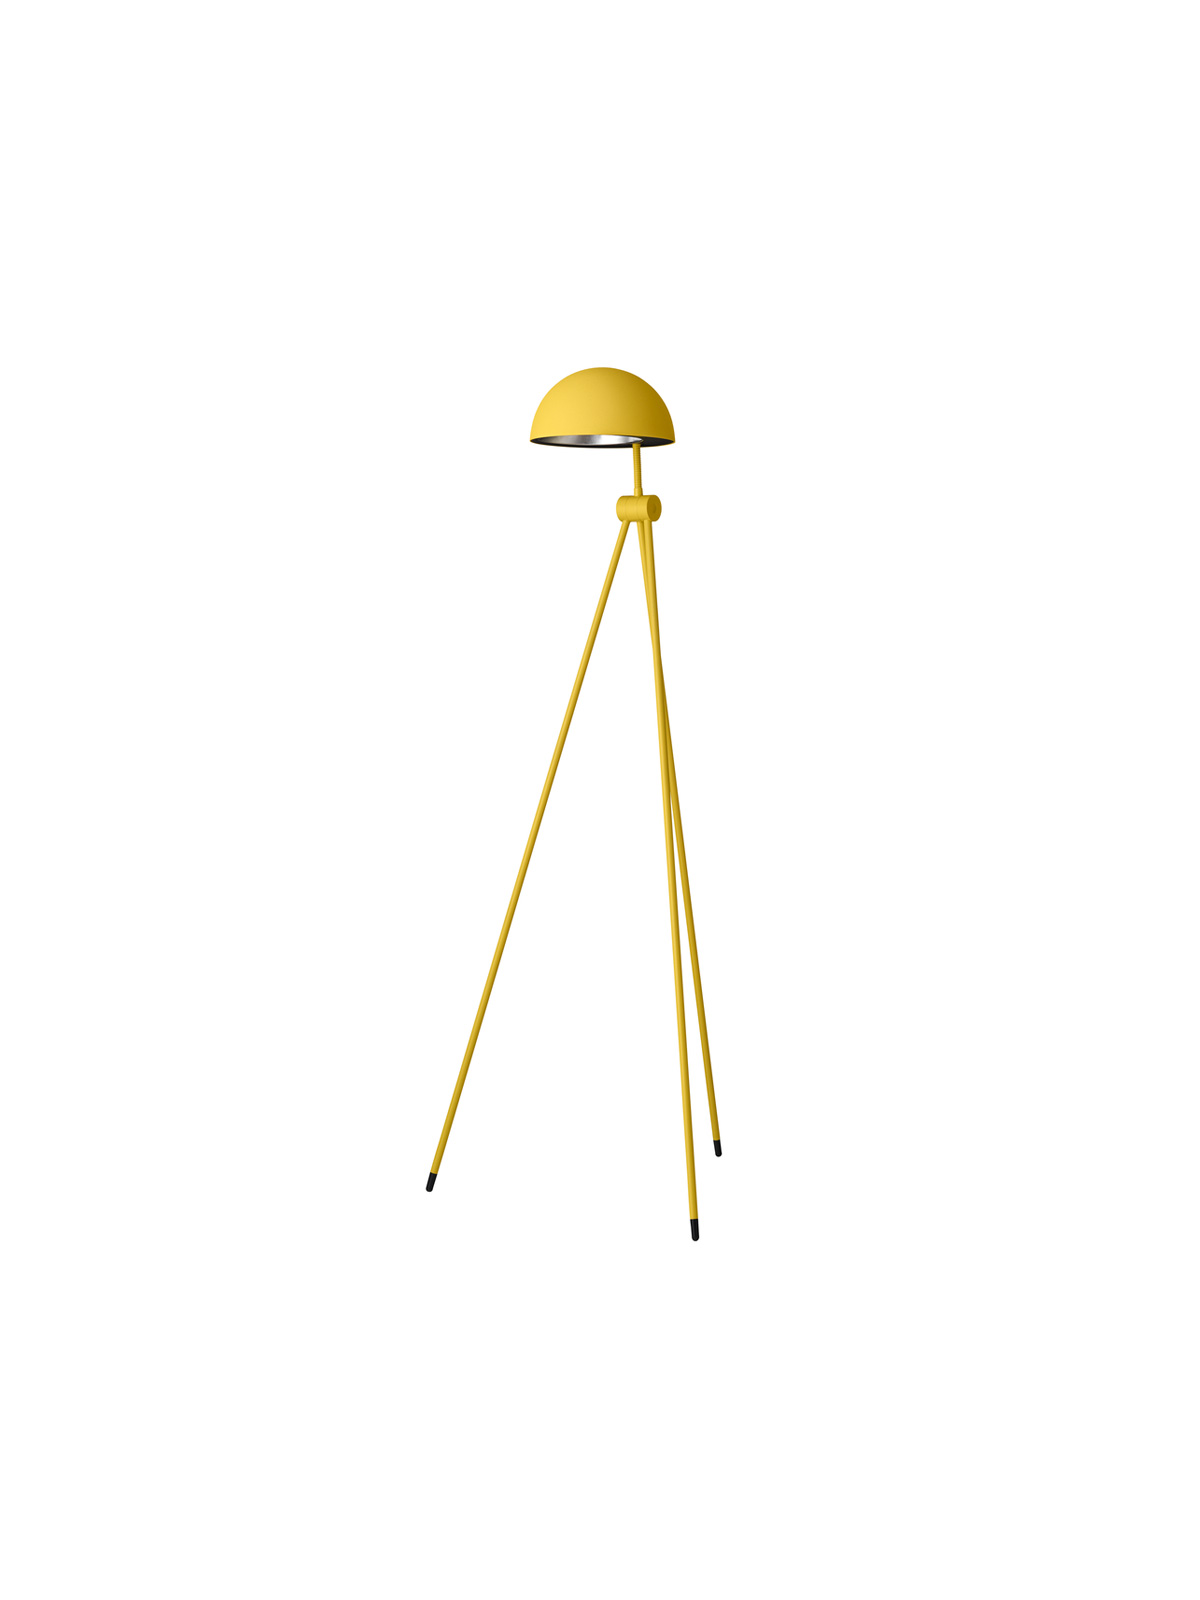 Stehlampe Radon in Gelb Lightyears